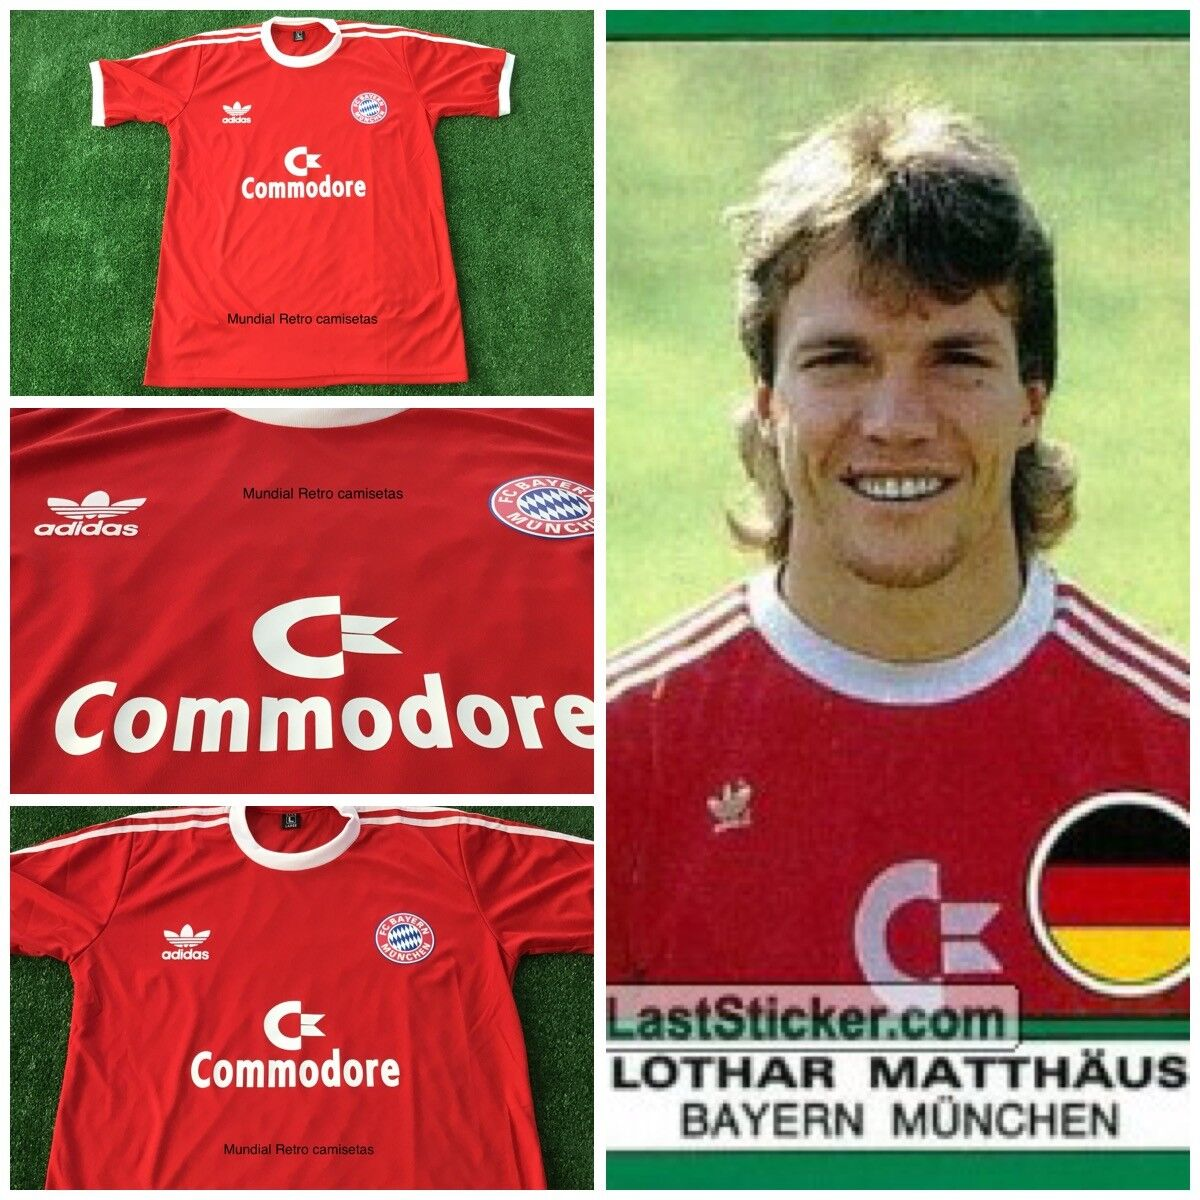 Bayern Munich champion 1987 jersey maglia camiseta (replica)